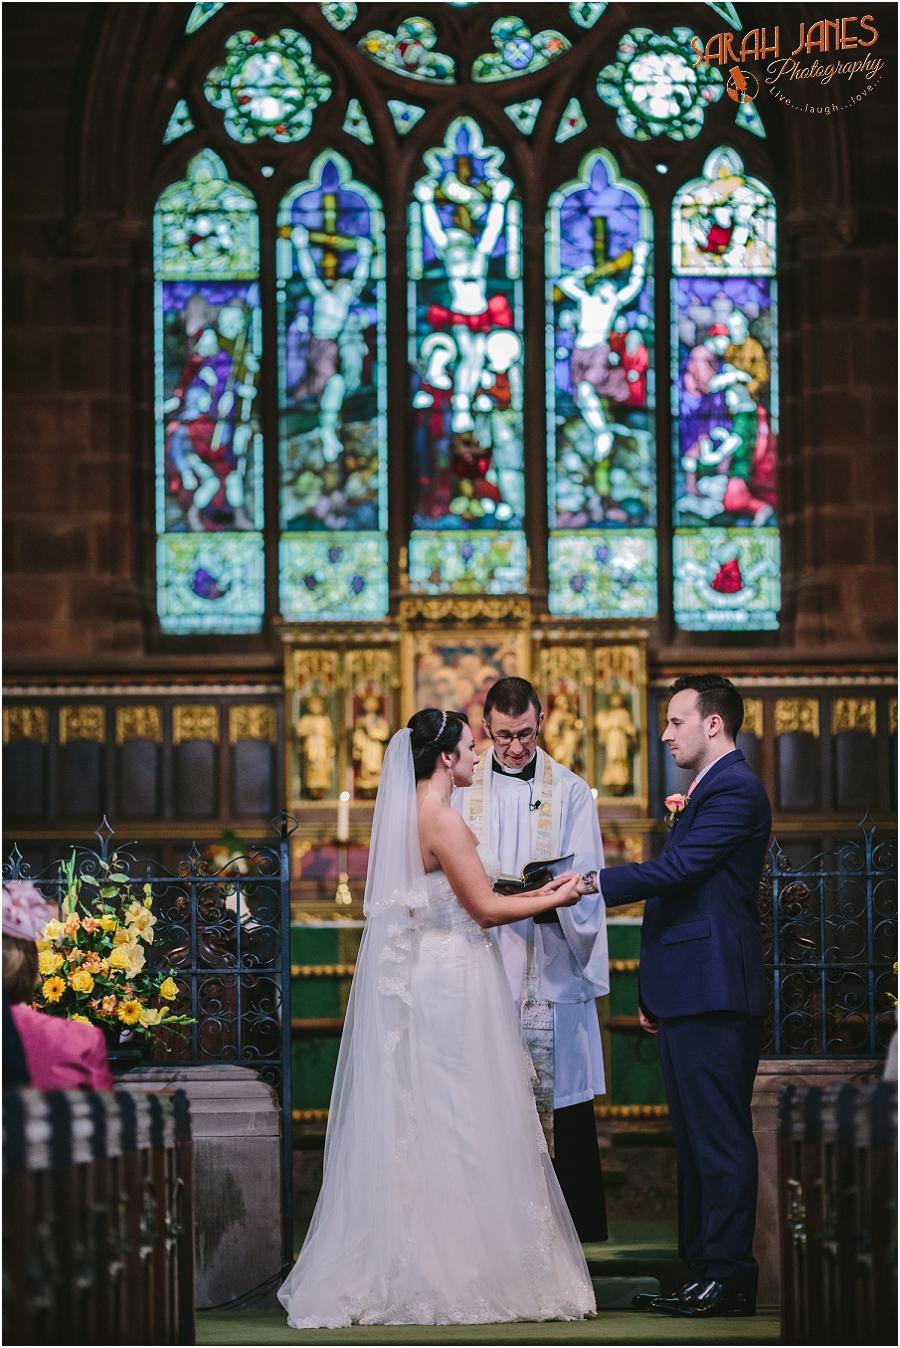 Oddfellows Wedding Photography, Quirky Wedding photography, Documentry Wedding Photography, Sarah Janes Photography,_0010.jpg